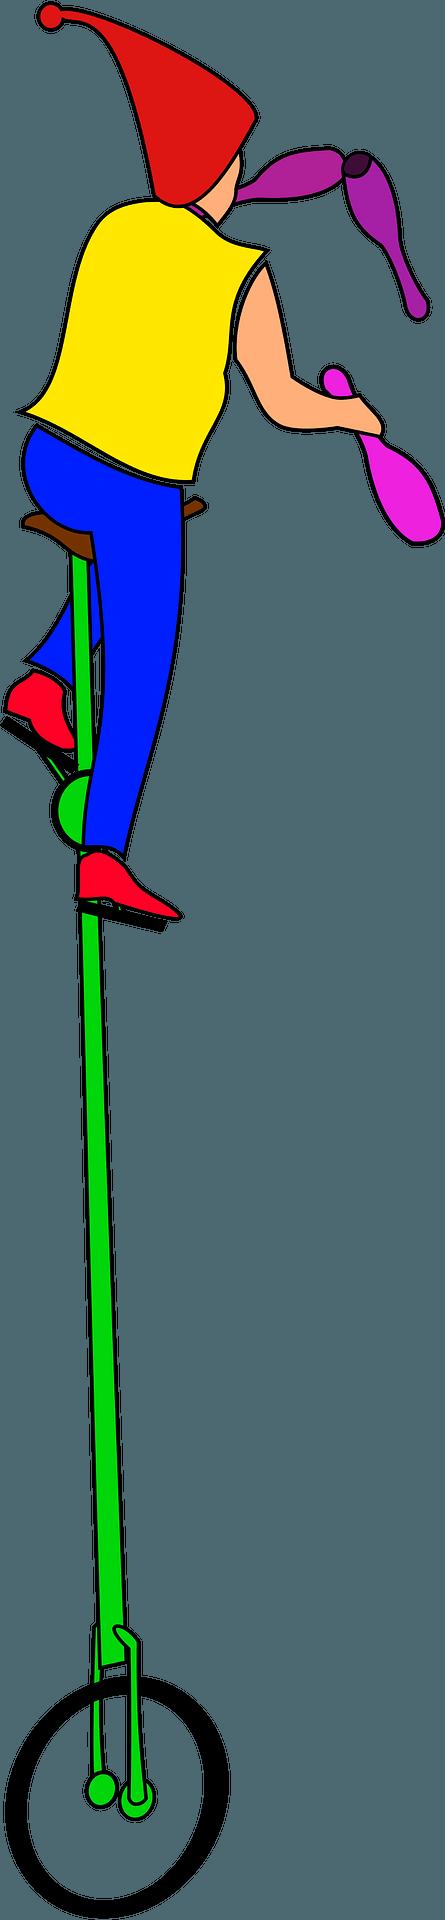 Free PNG Juggler Clip Art Download - PinClipart